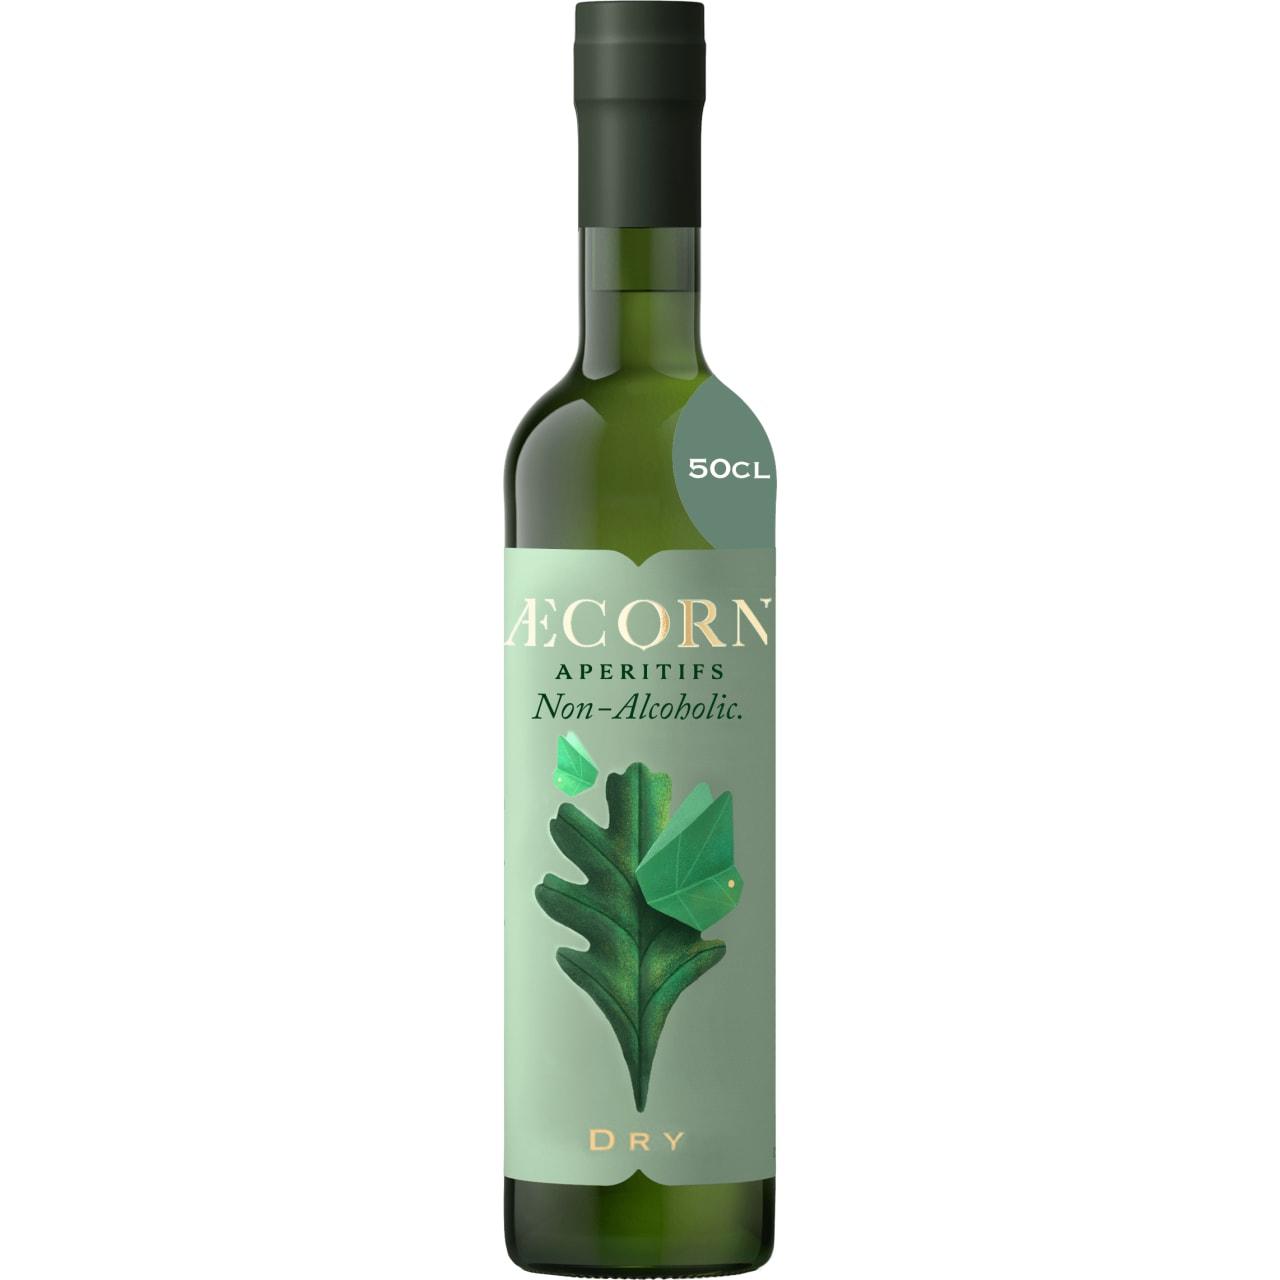 Product Image - Aecorn Dry